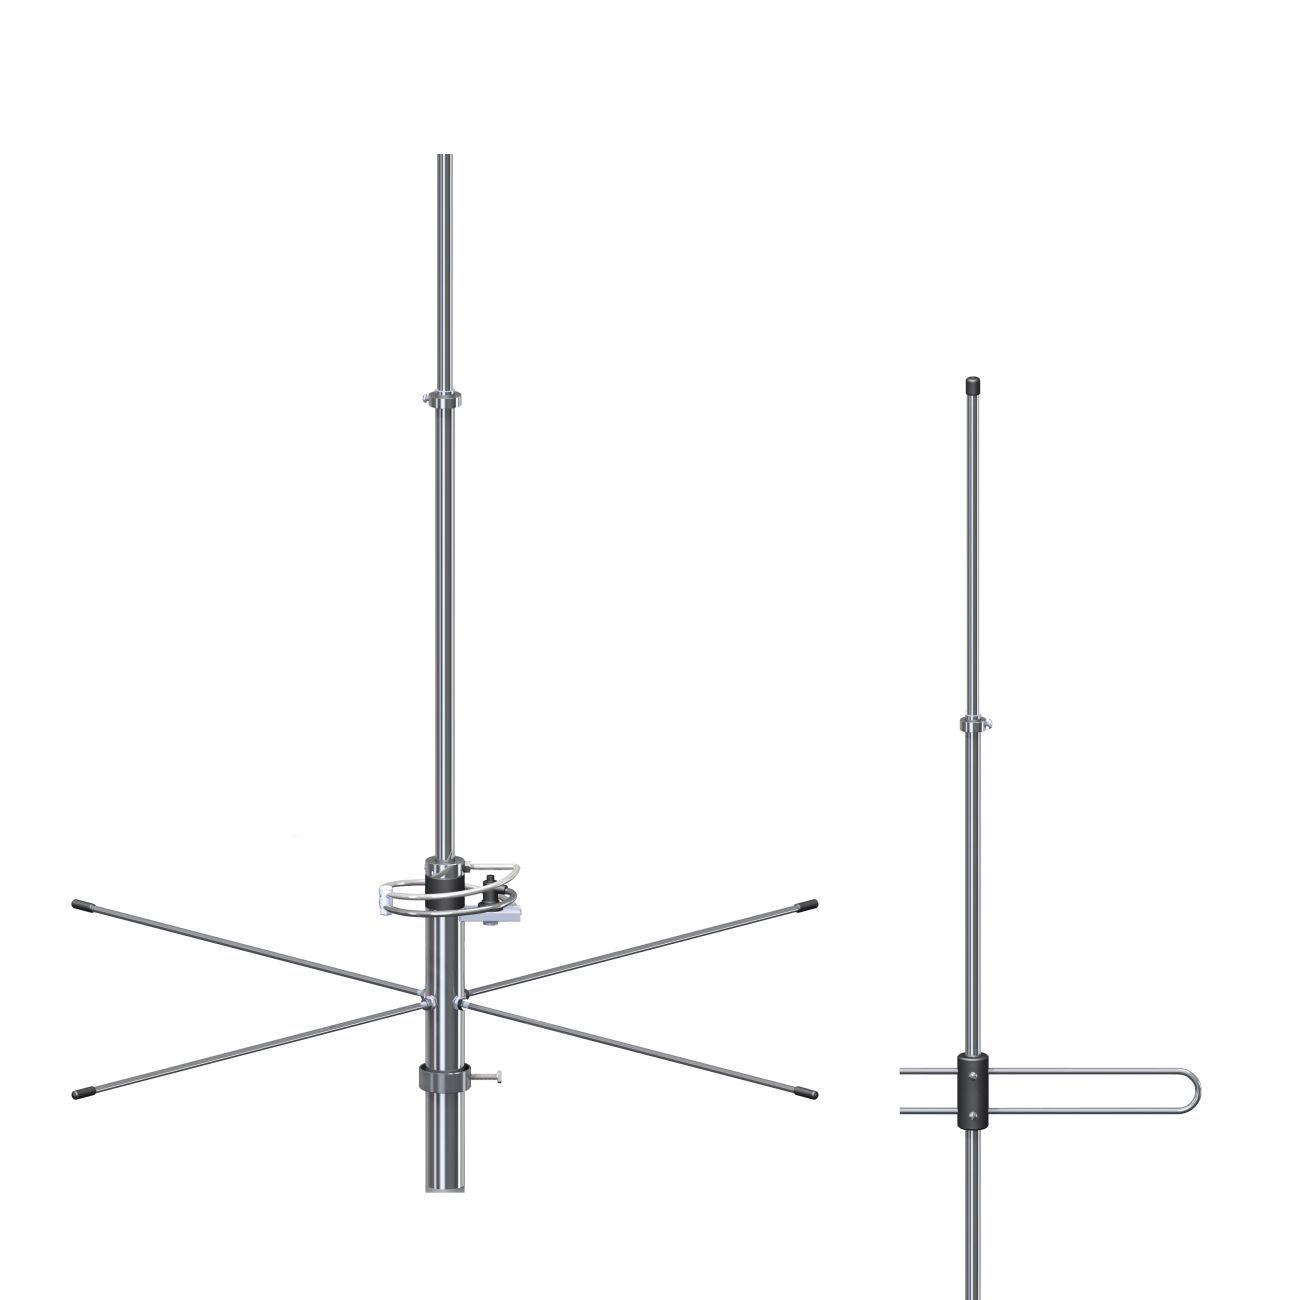 Antena Base VHF 2x5/8 De Onda 6db 220mhz Steelbras - Ap7249